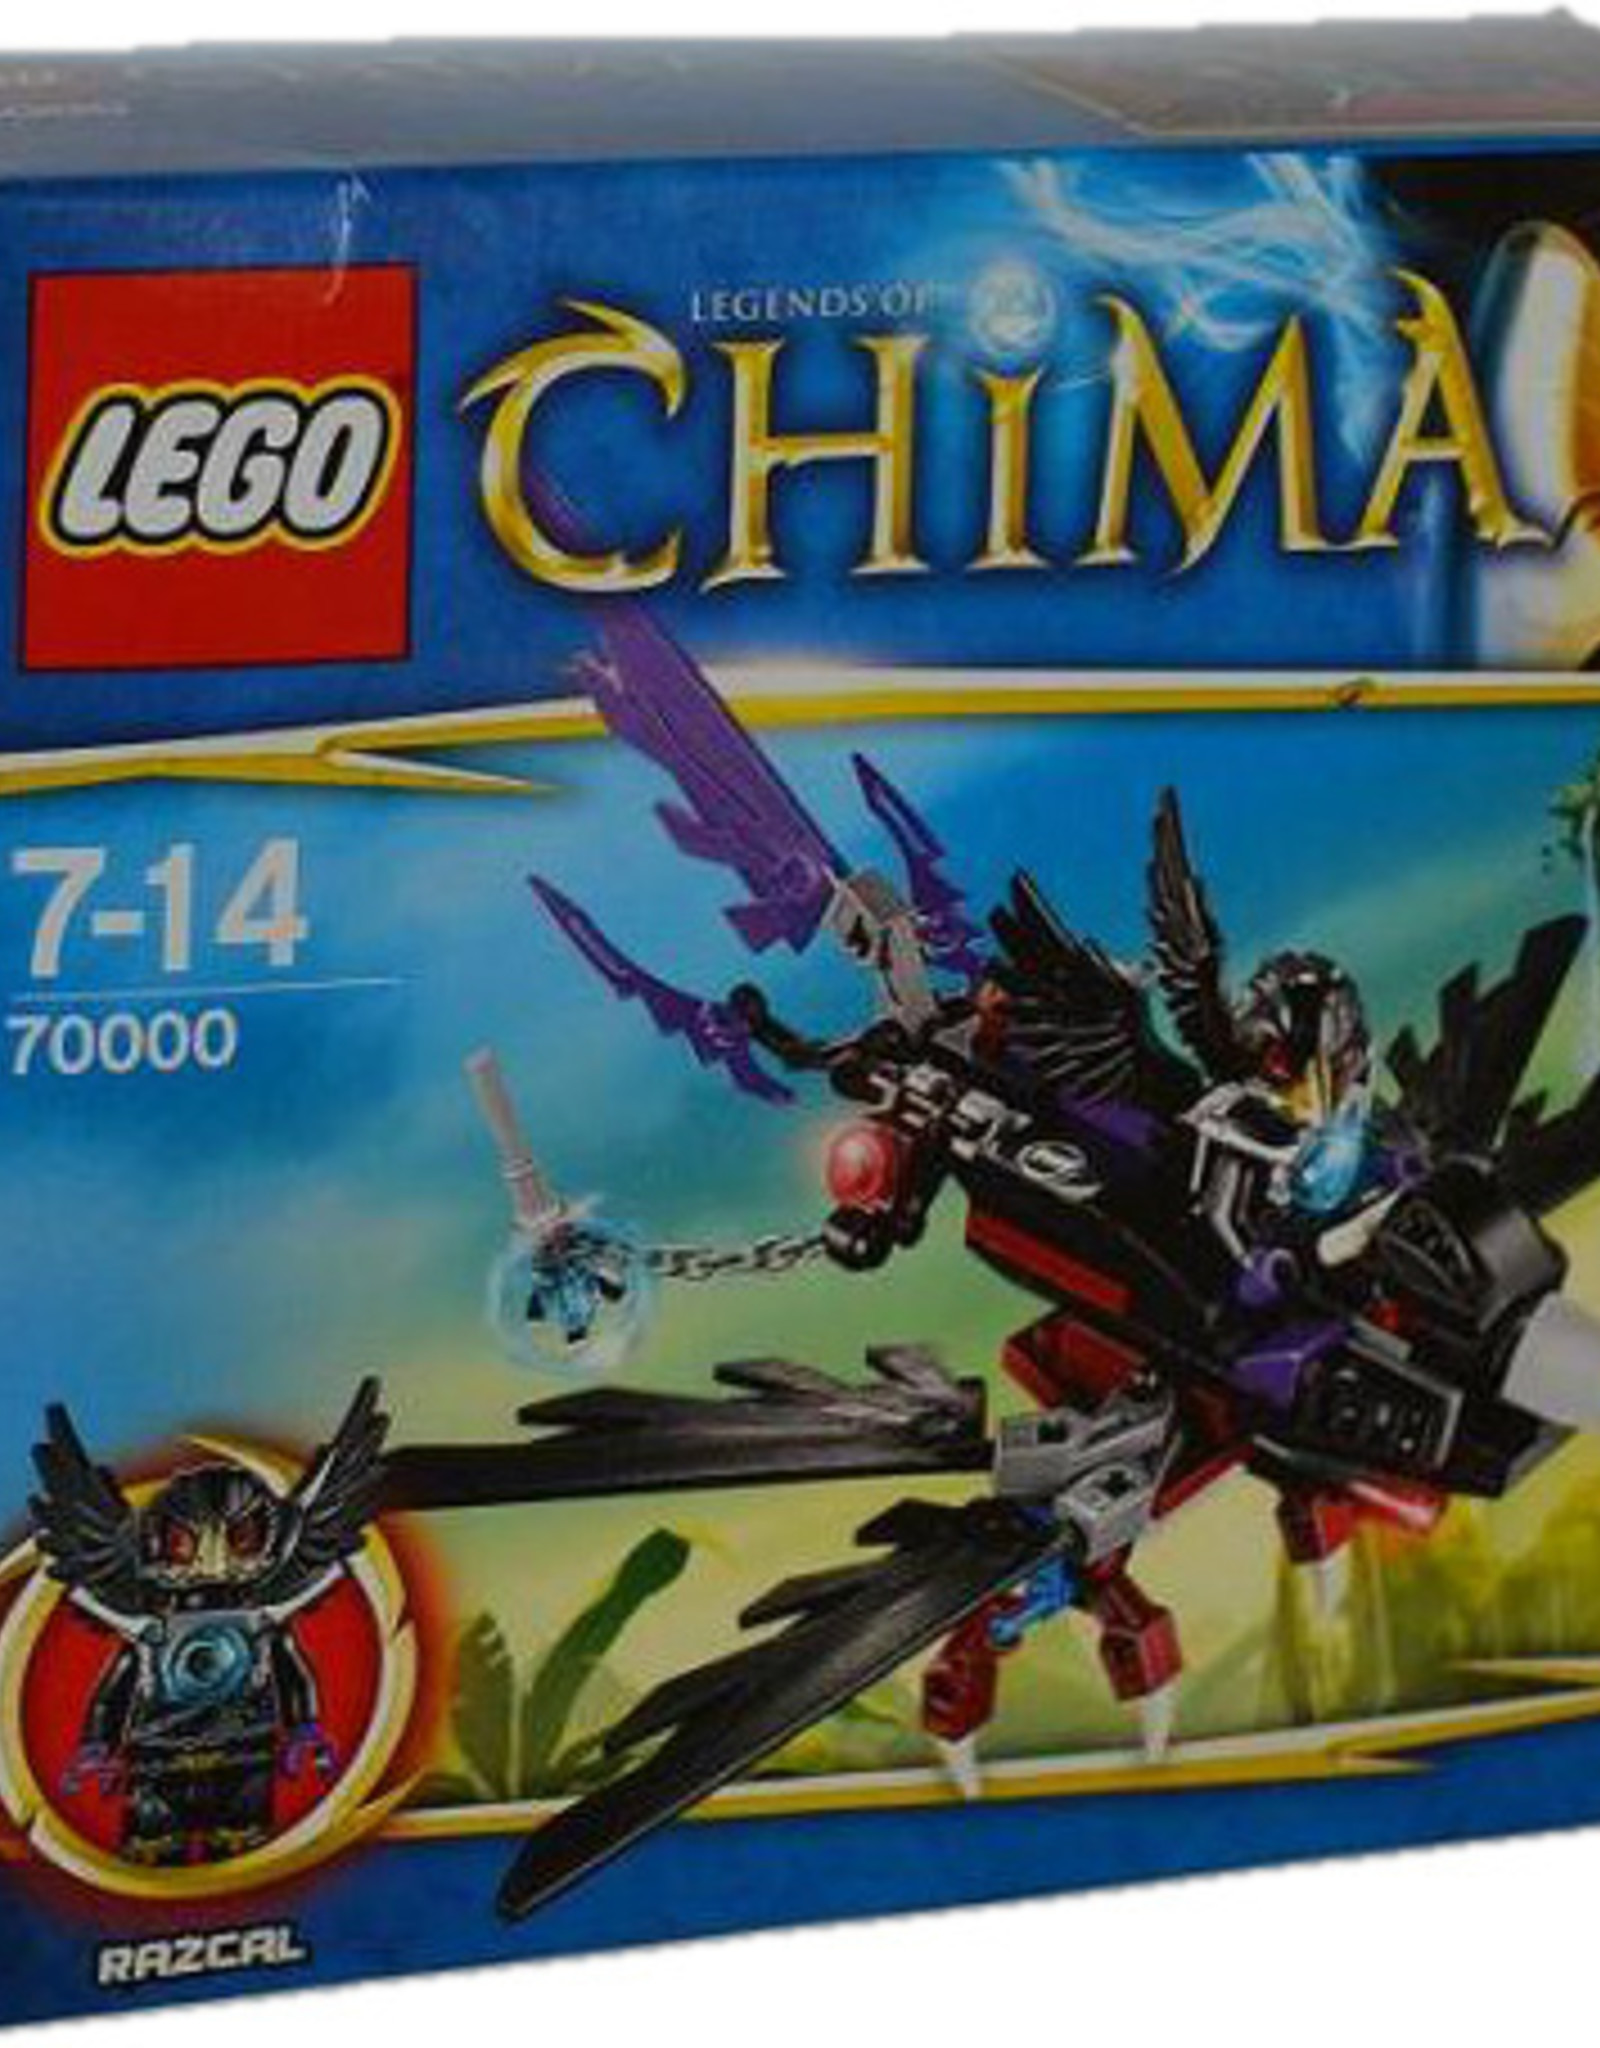 LEGO LEGO 70000 Razcal's Glider CHIMA